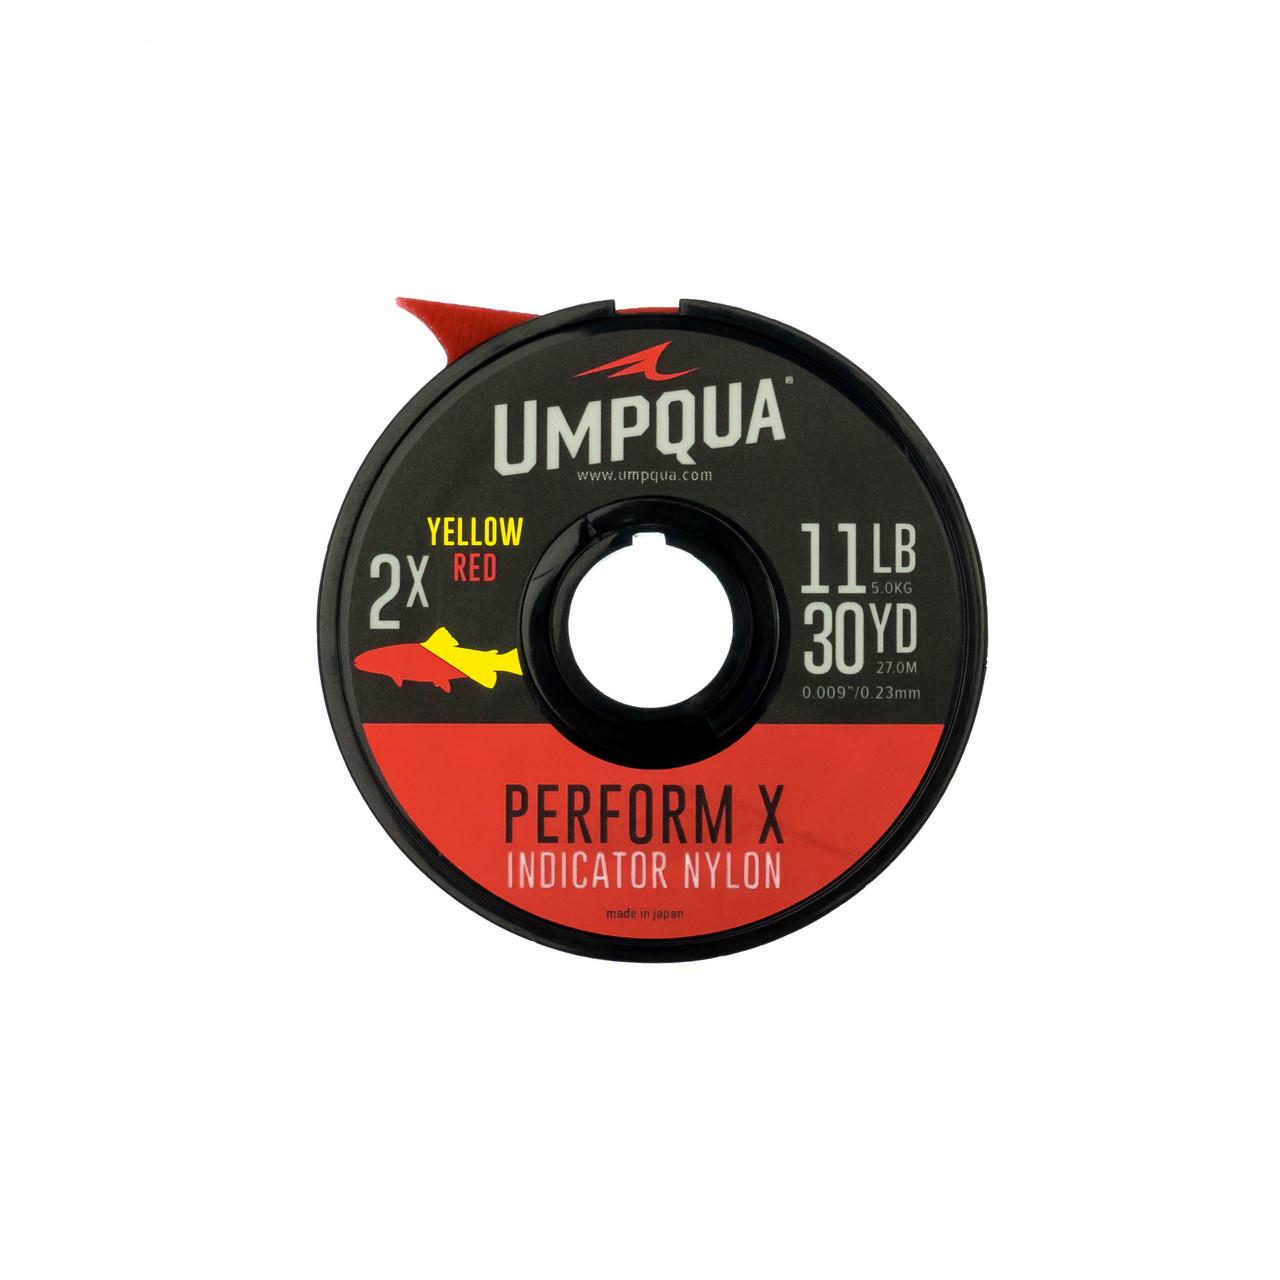 Fly Fishing 3X Umpqua Tippet Material 30yd